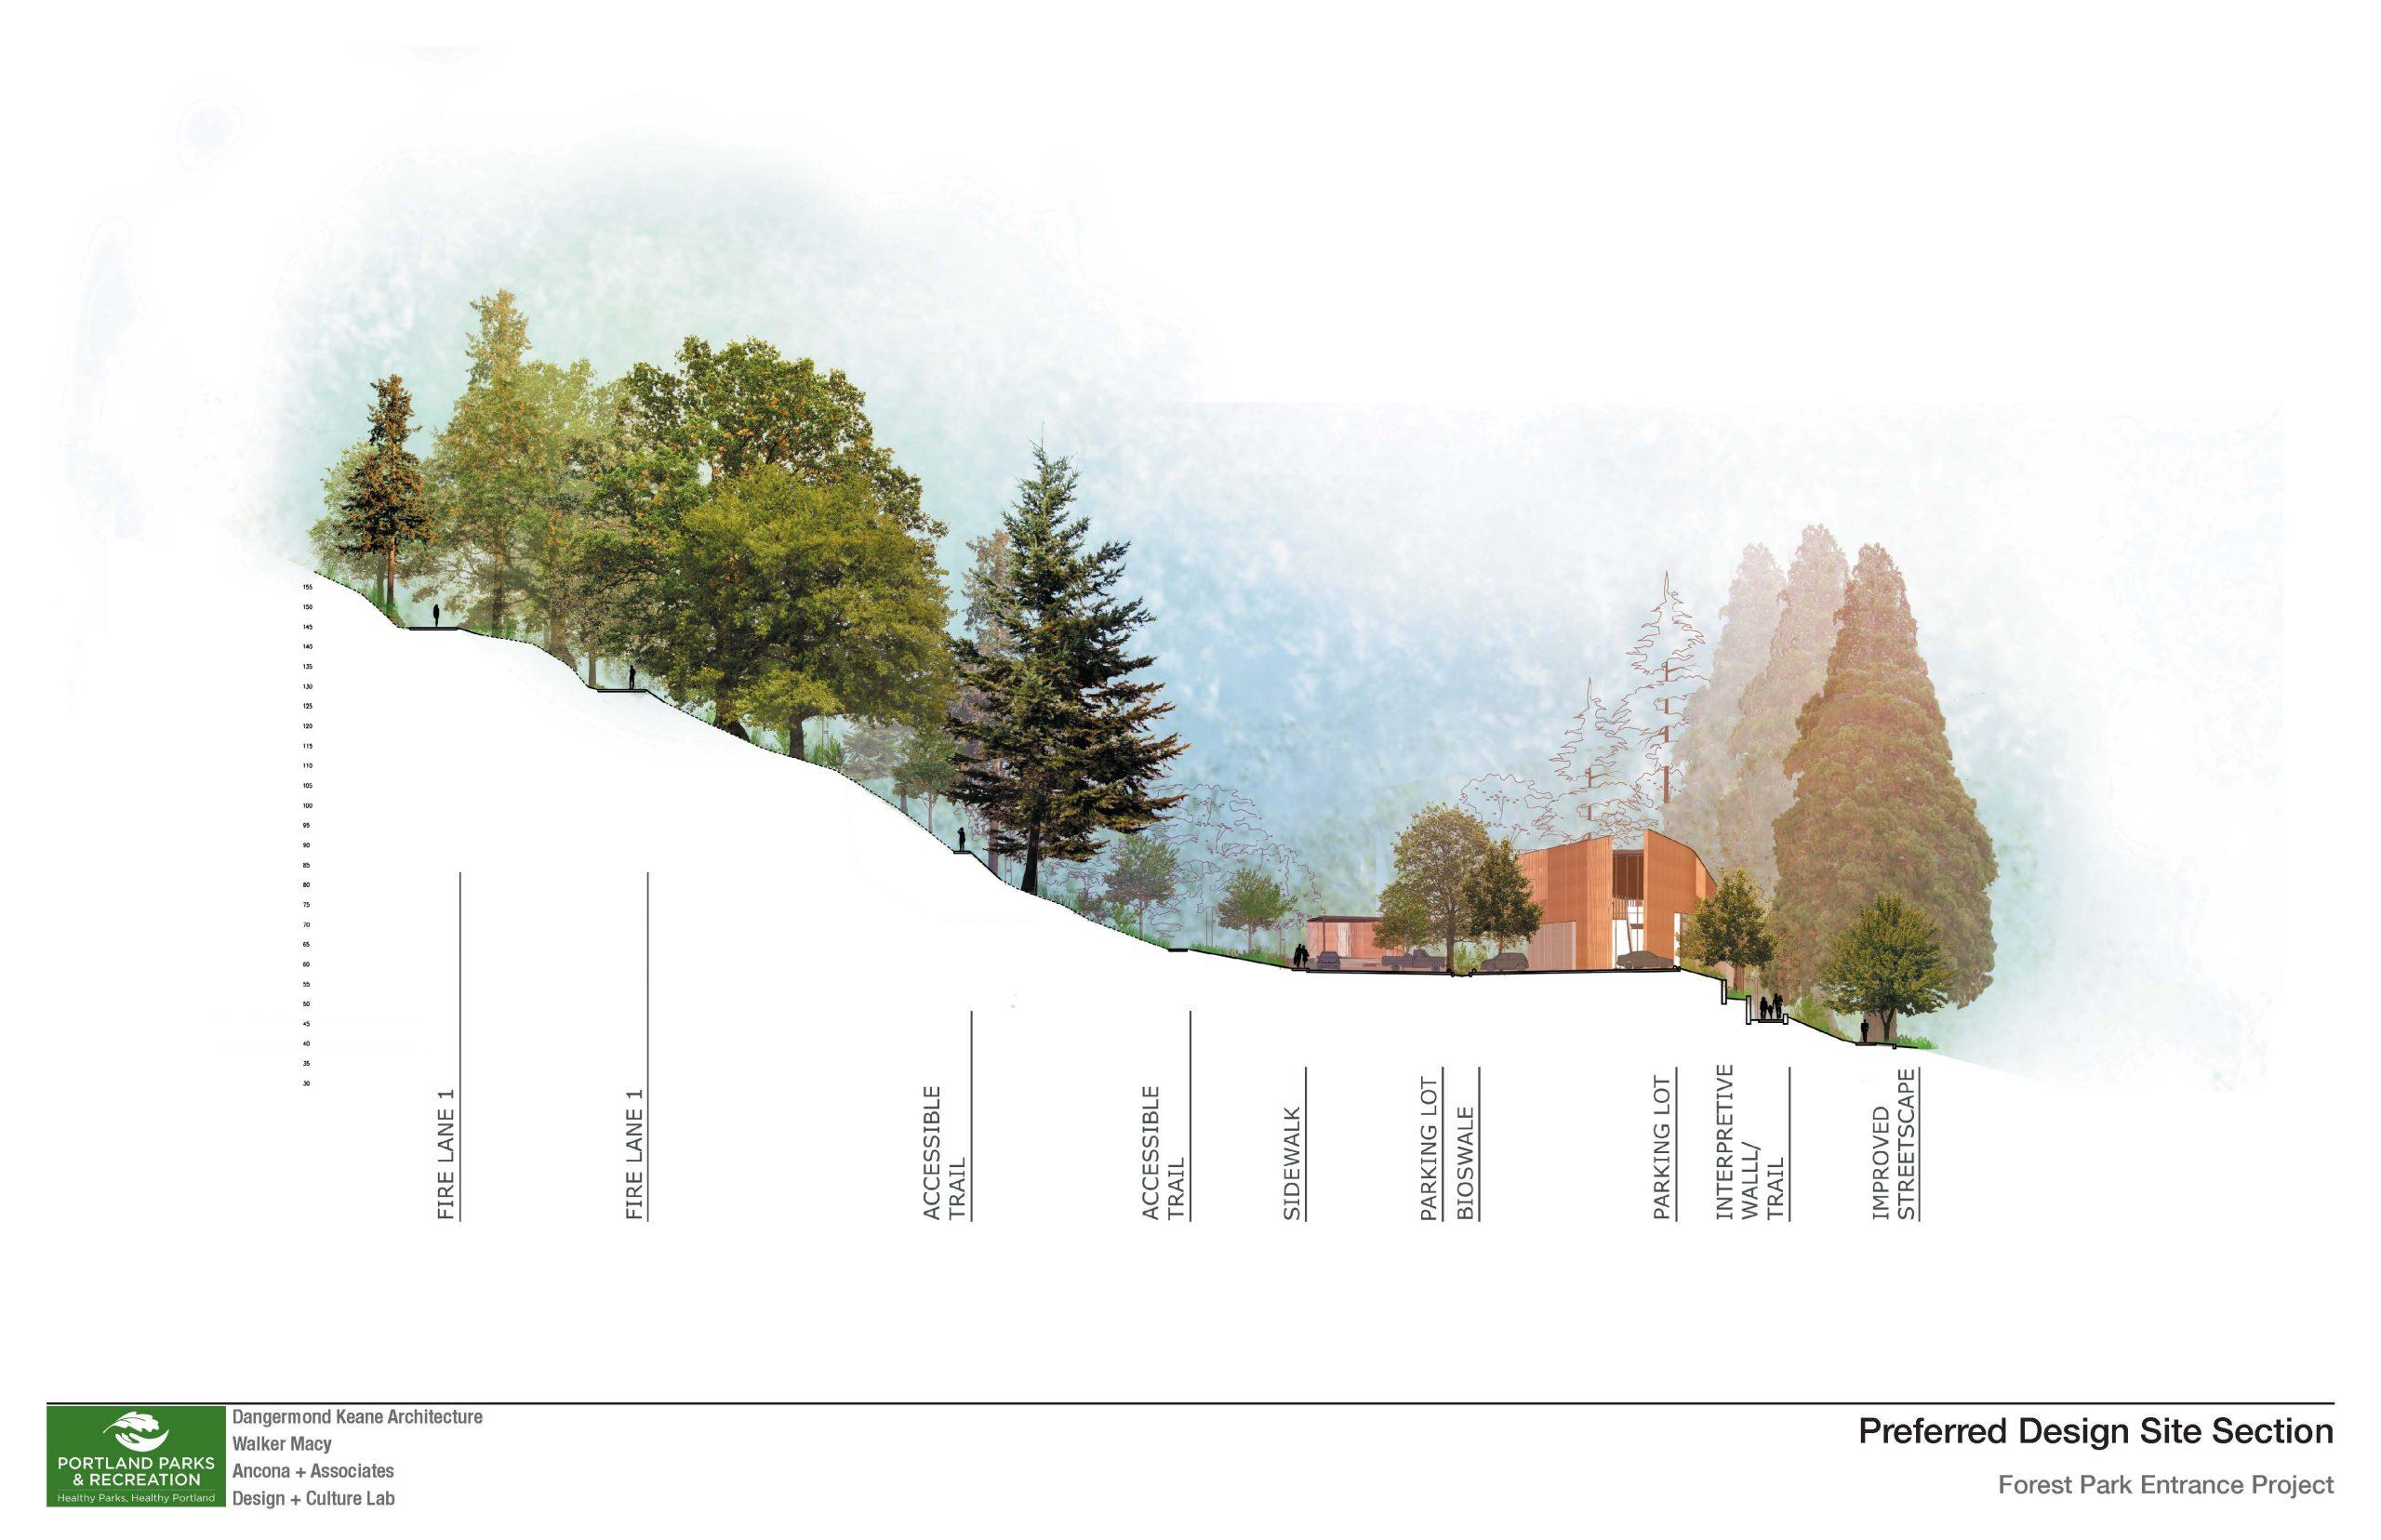 Forest Park Entrance Project